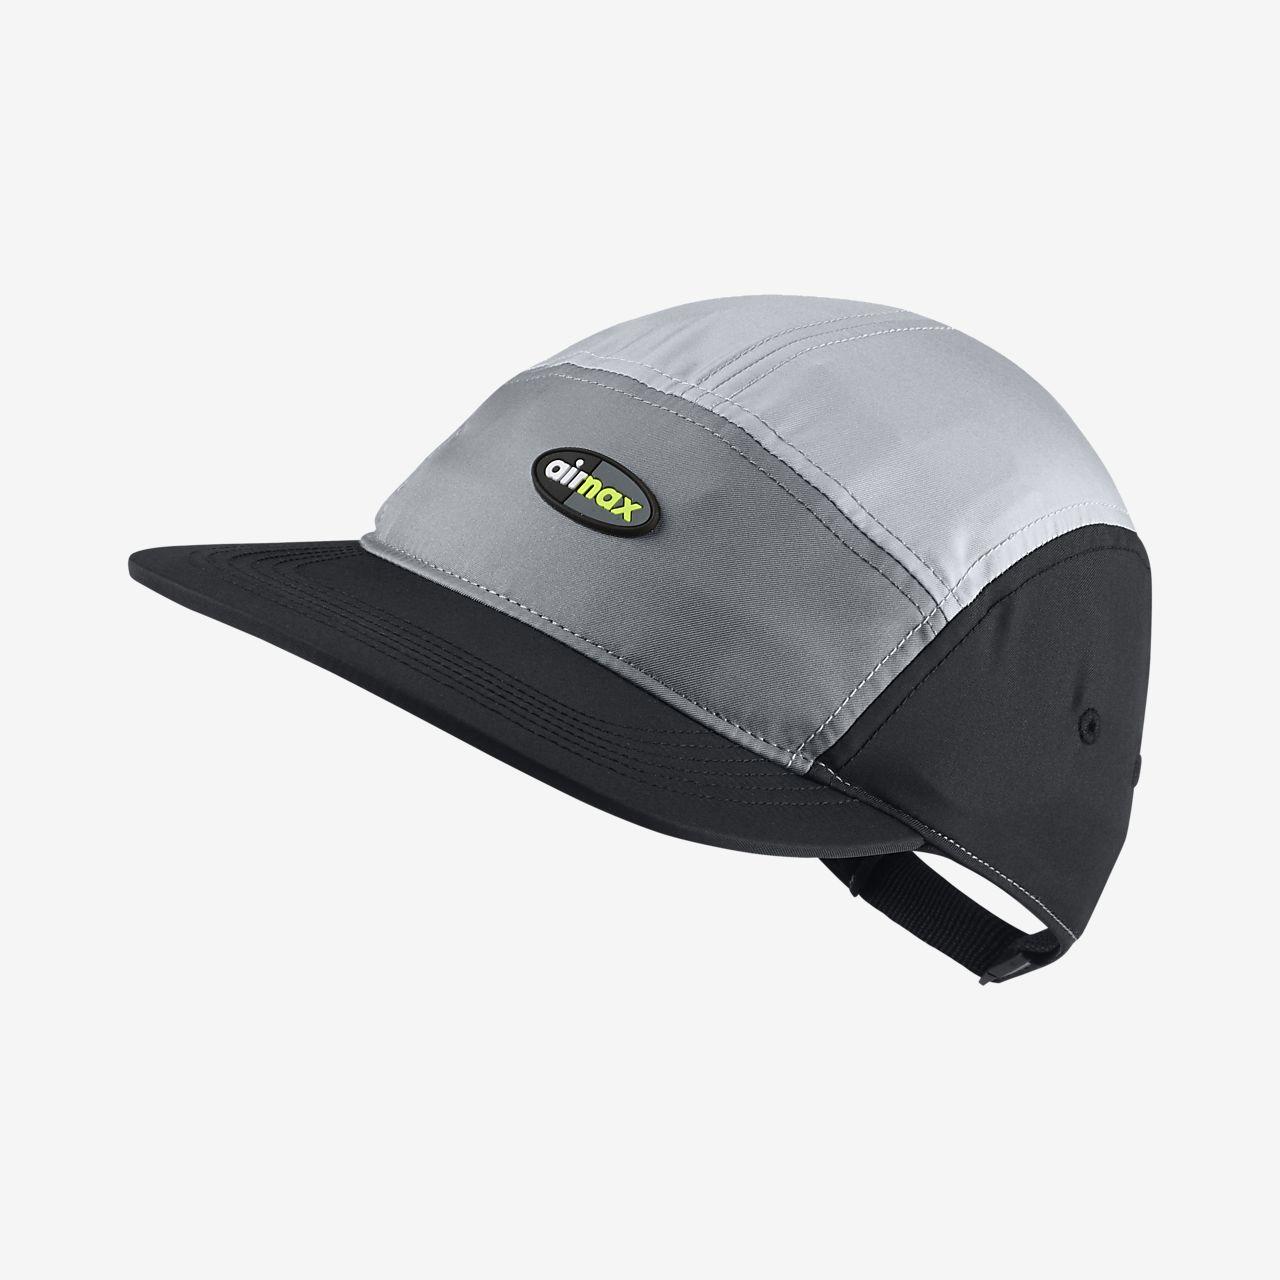 d6c64a0571f Nike Sportswear AW84 Adjustable Hat. Nike.com IN